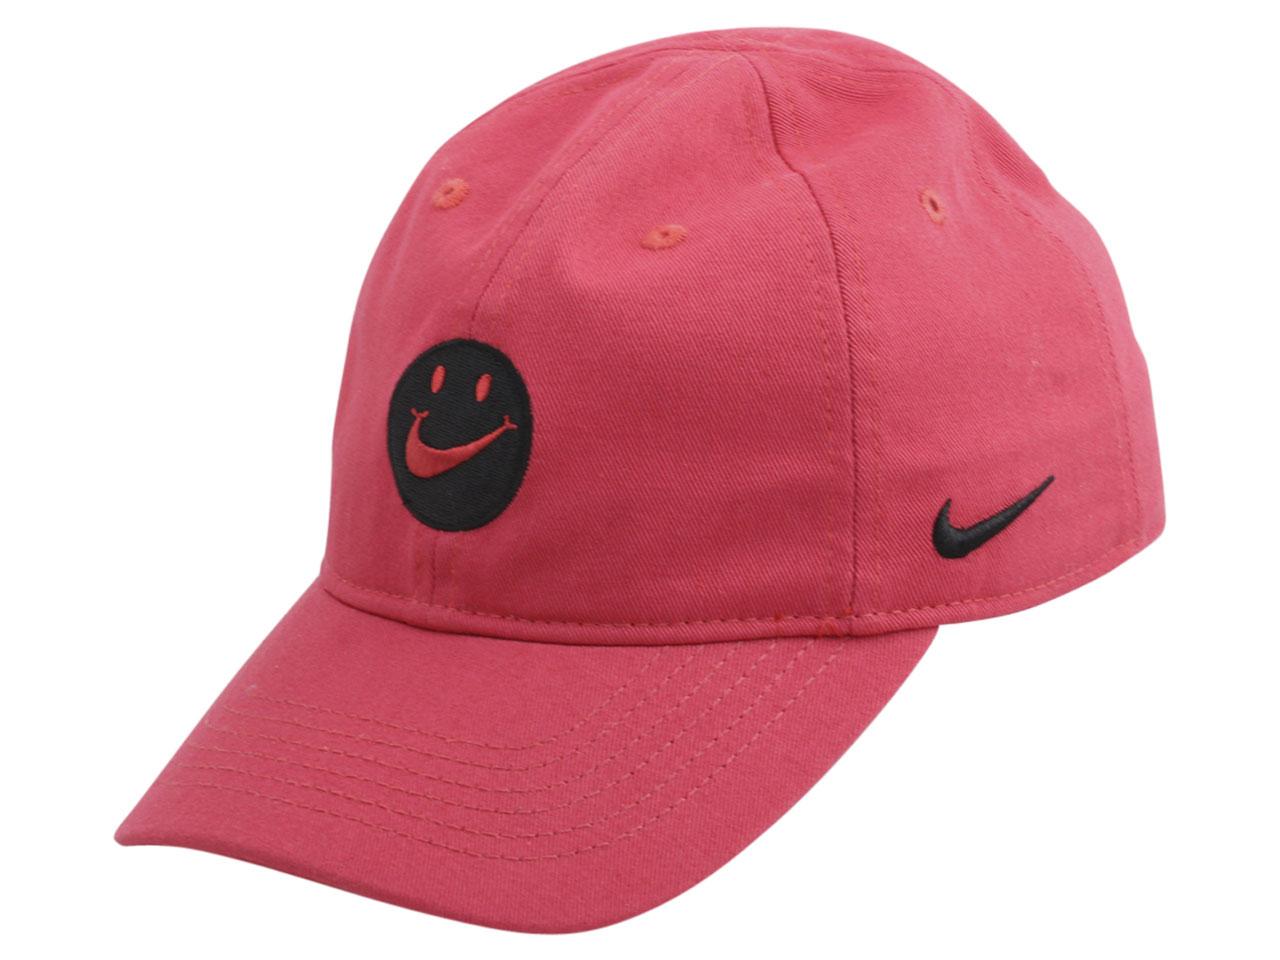 088adf8f457 Nike Little Kid s Swoosh Patch Strapback Cotton Baseball Cap Hat